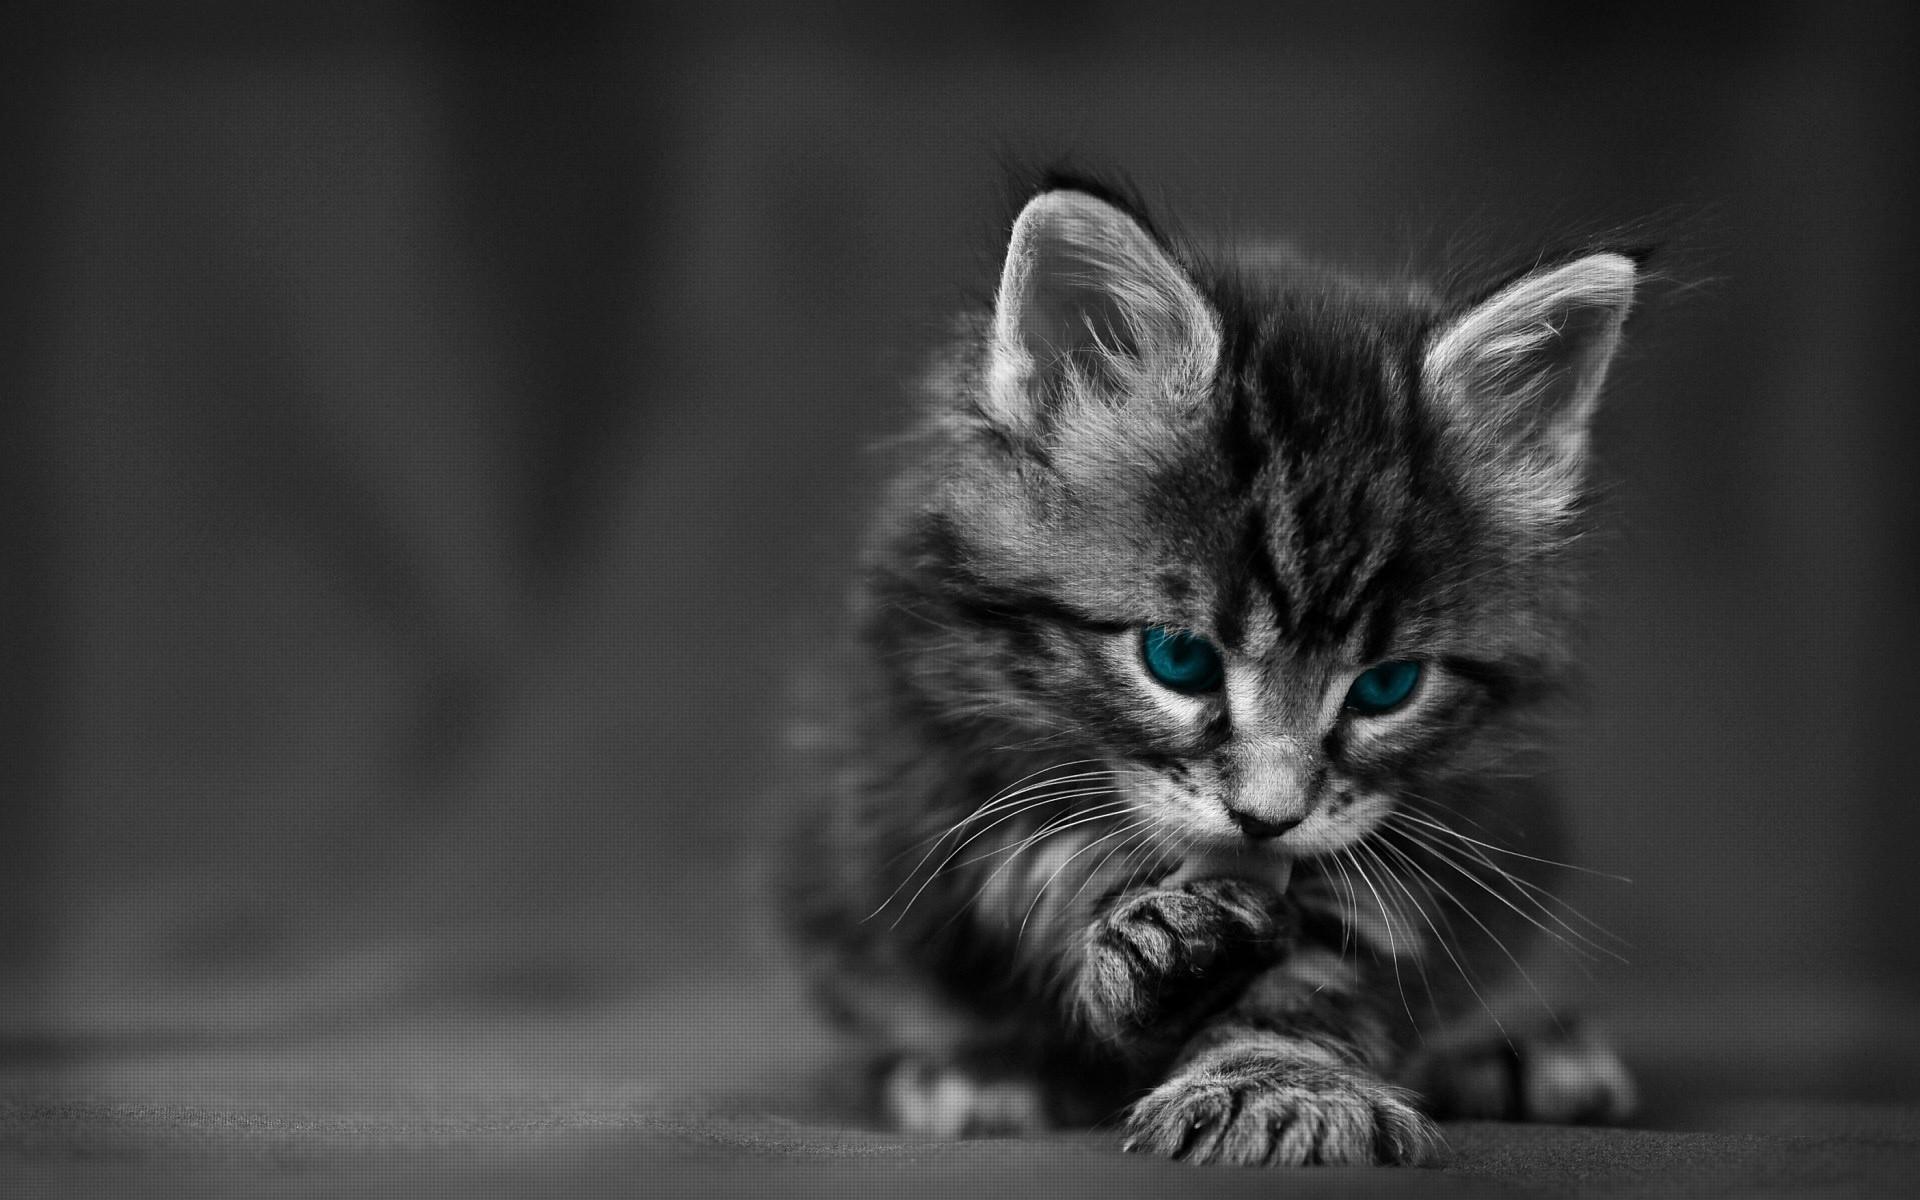 Wallpaper Kitten Blue Eyed Furry Cat Wash 1920x1200